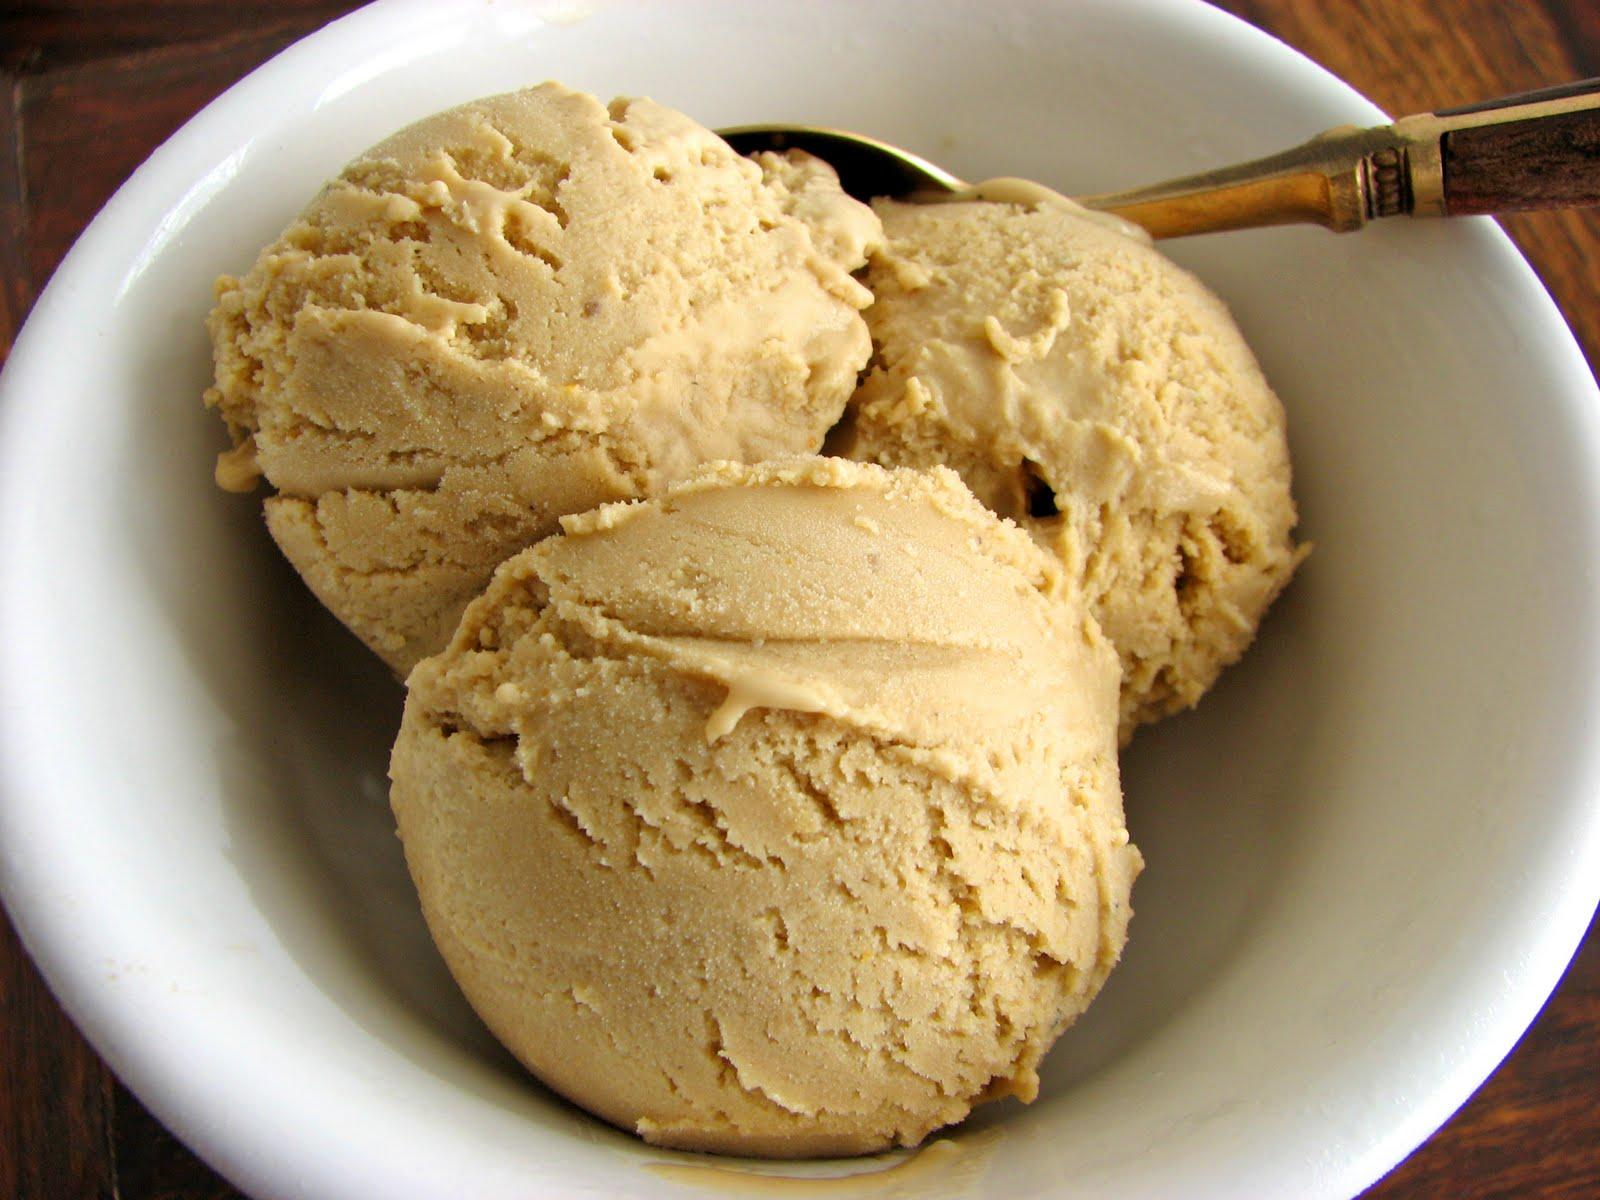 Coffee Ice-Cream - Ice Cream Photo (34732916) - Fanpop